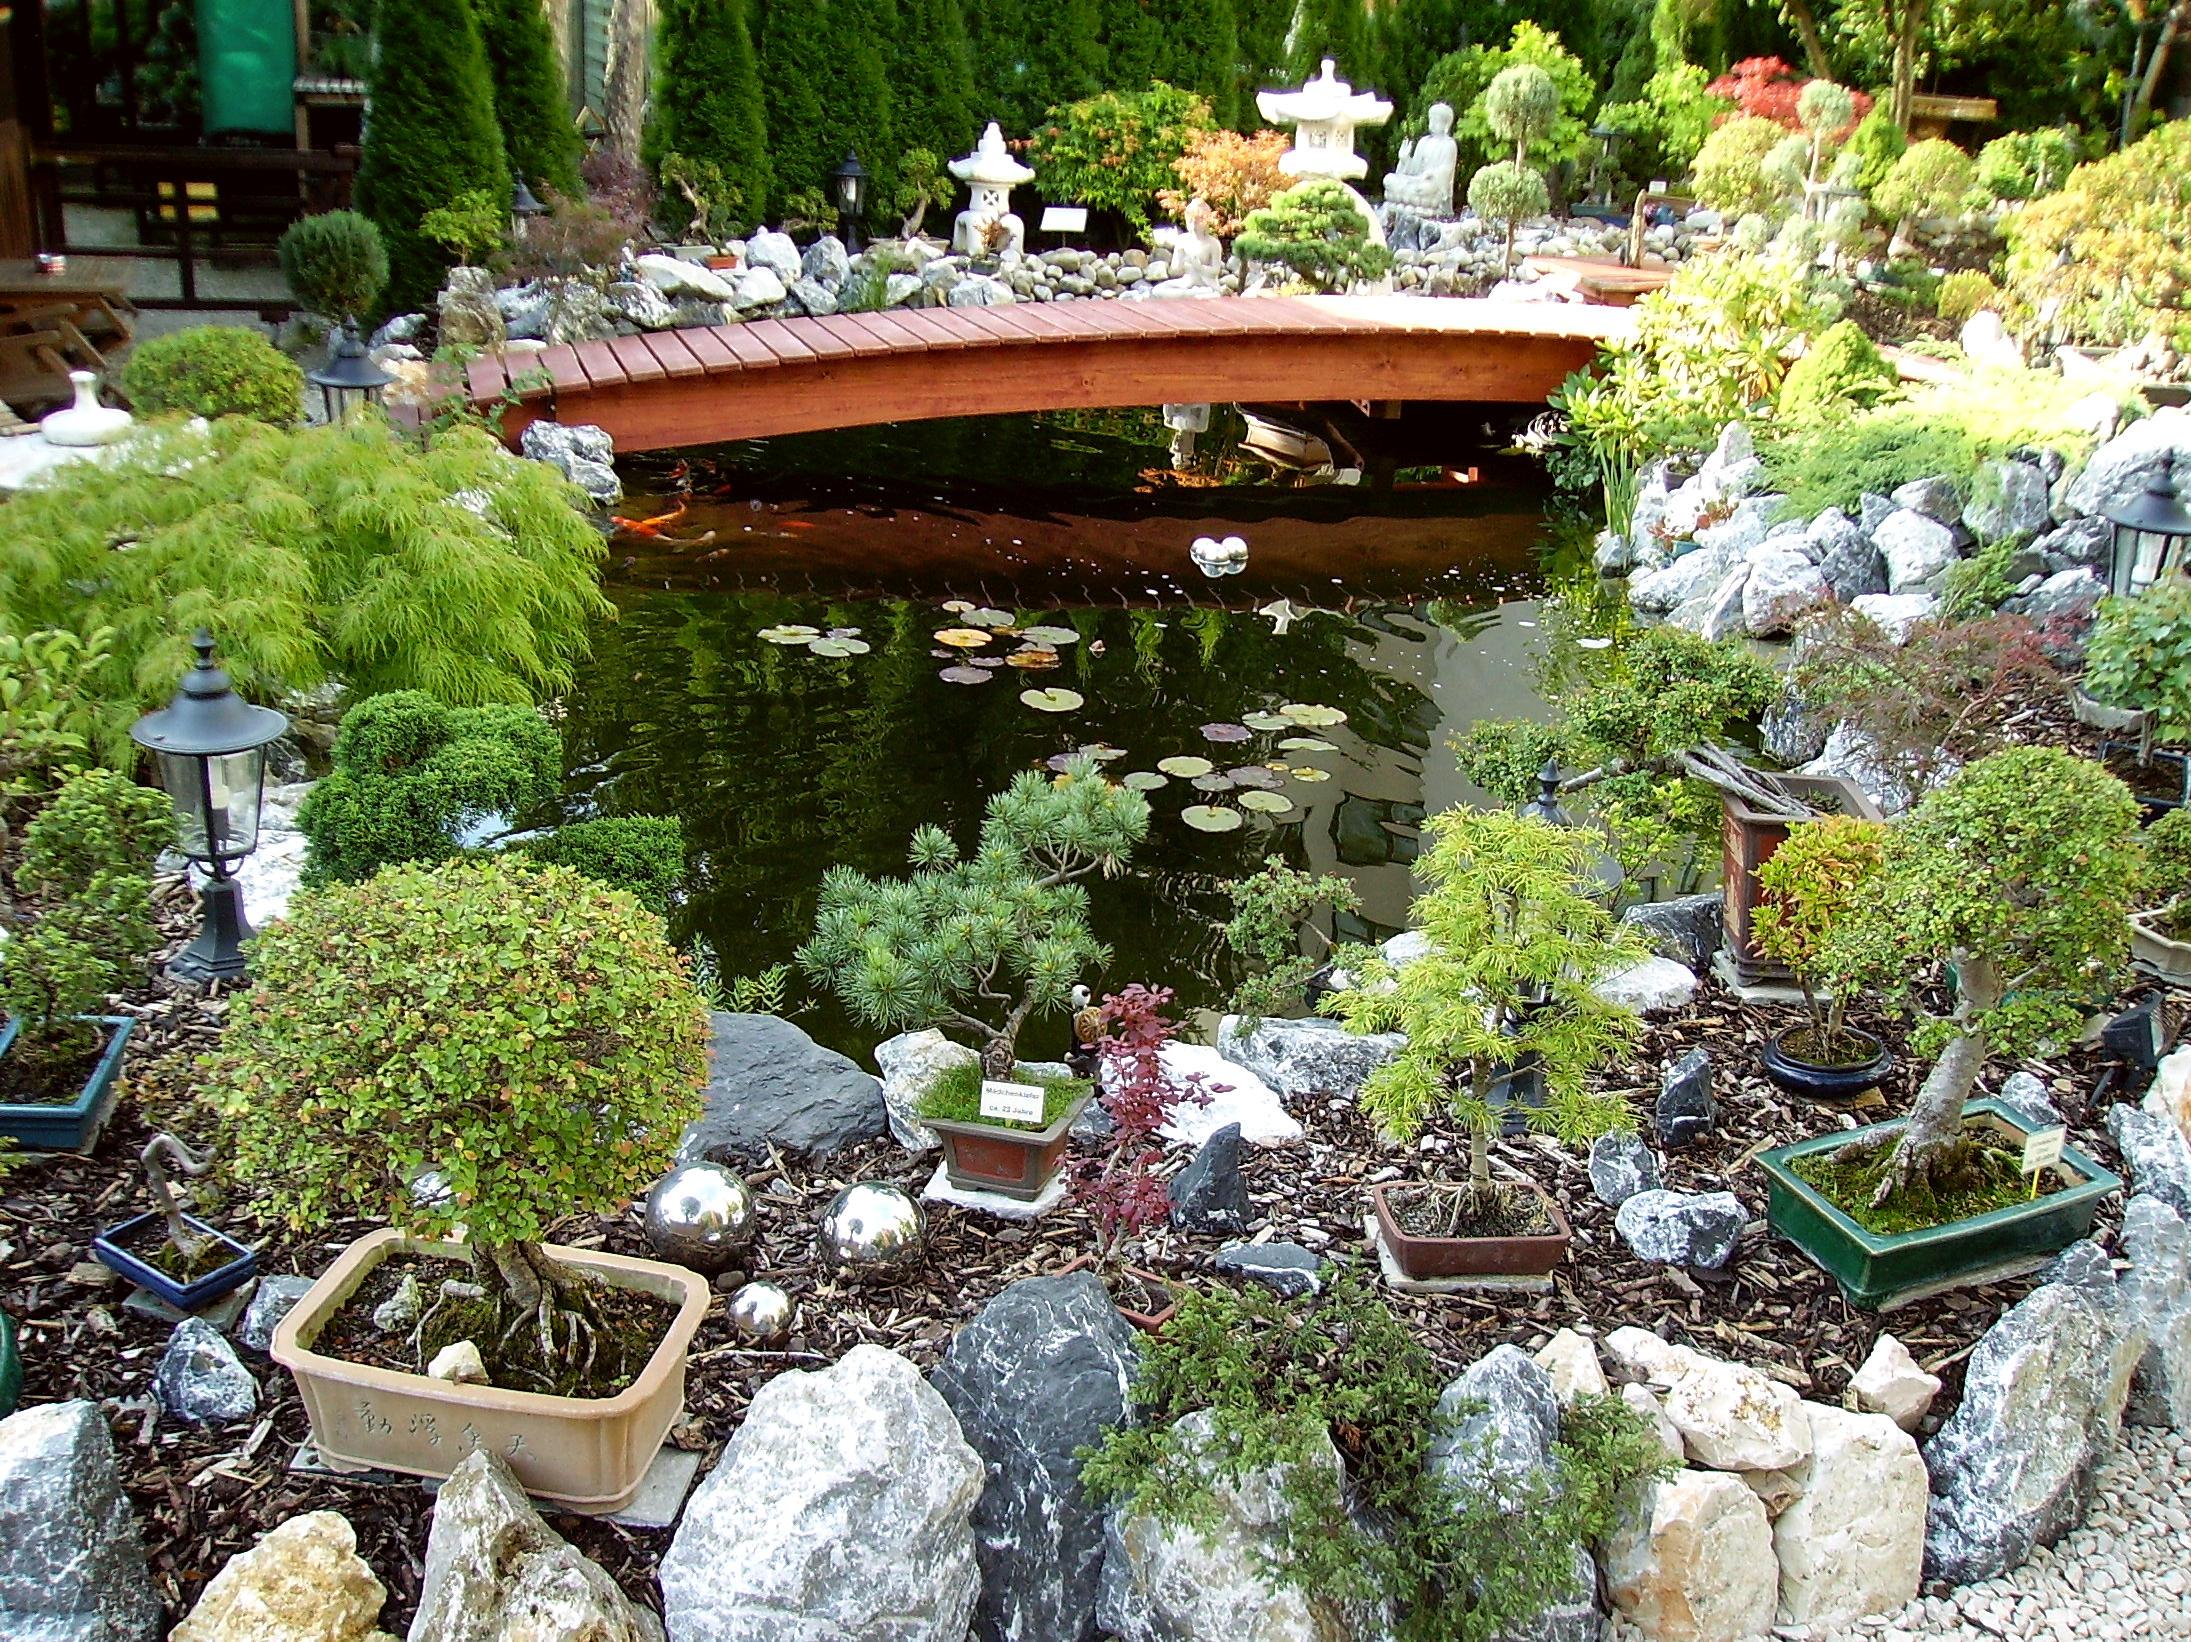 Ueber uns for Whirlpool garten mit bonsai samen shop